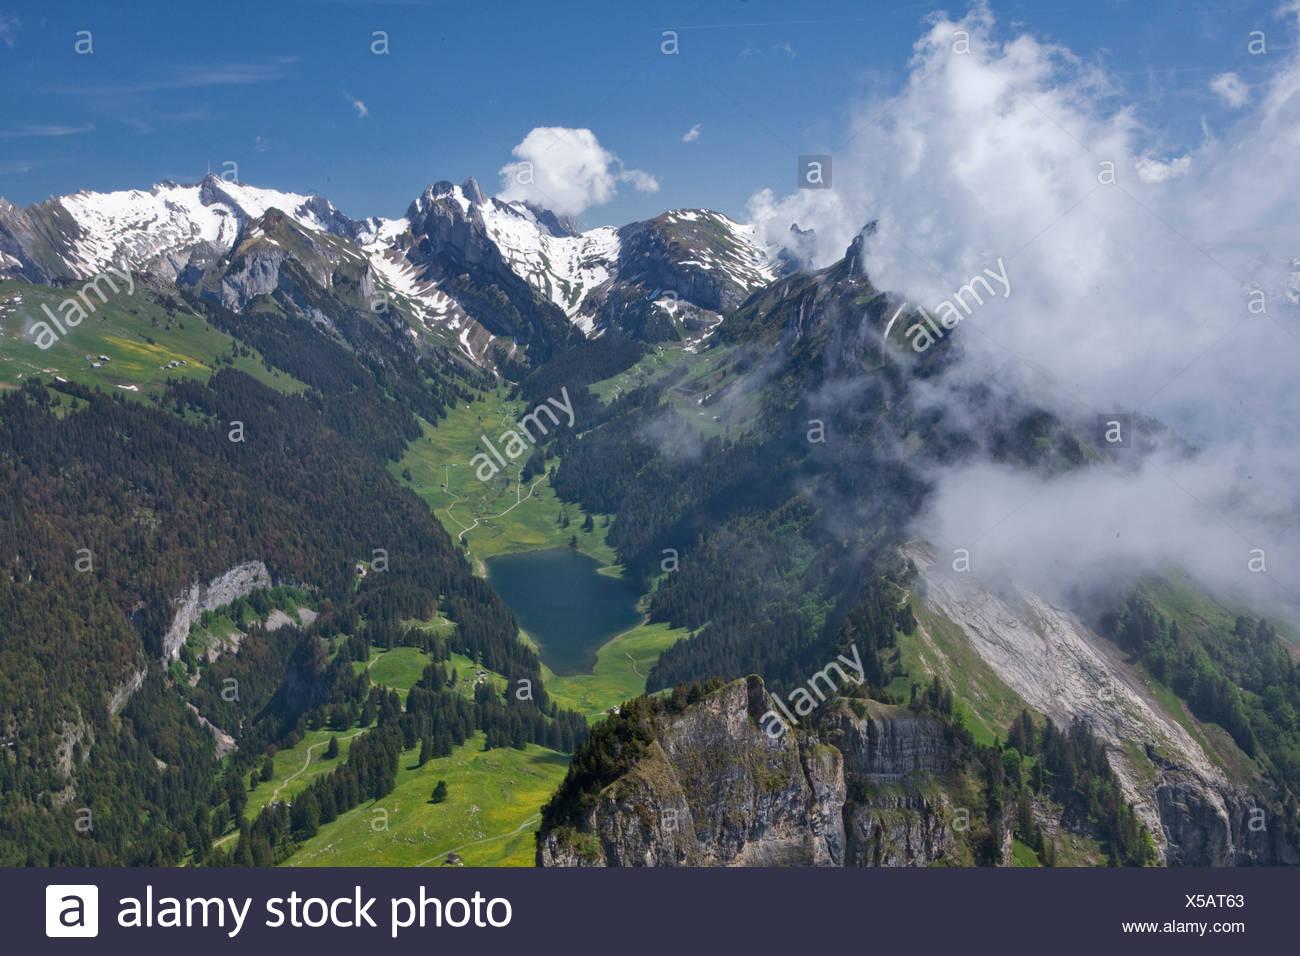 To high castes, box, Alpstein, mountain, mountains, canton, Appenzell, Innerroden, Appenzell area, Alpstein, Säntis, weather, la - Stock Image